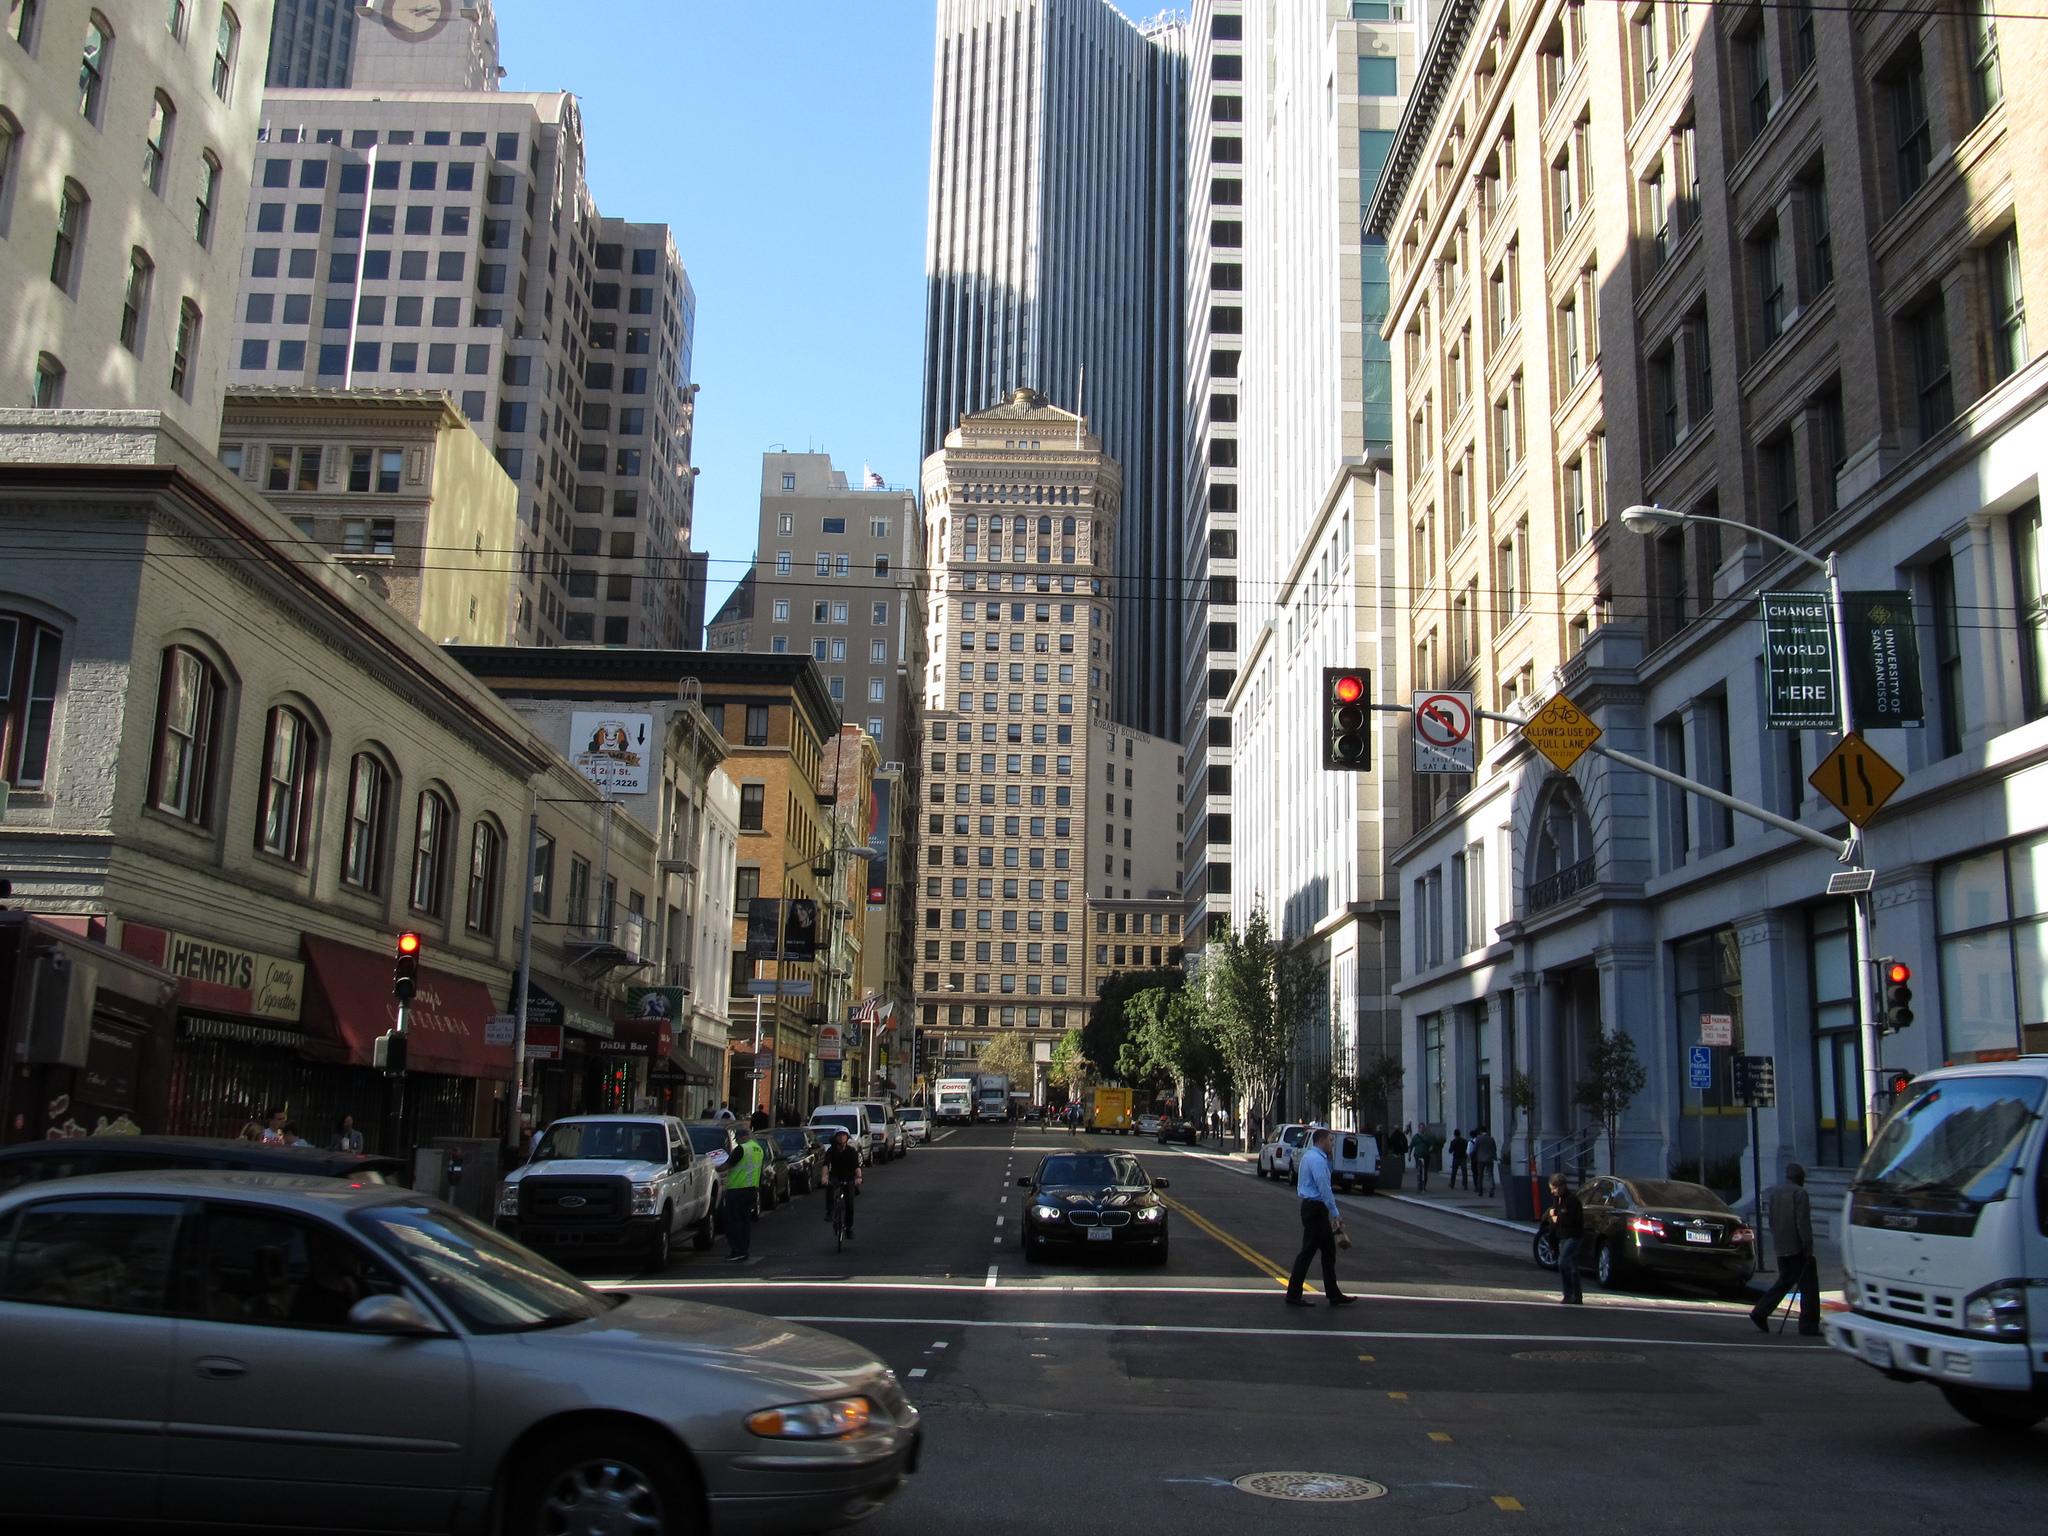 Second Street begins rebirth as pedestrian, bike corridor